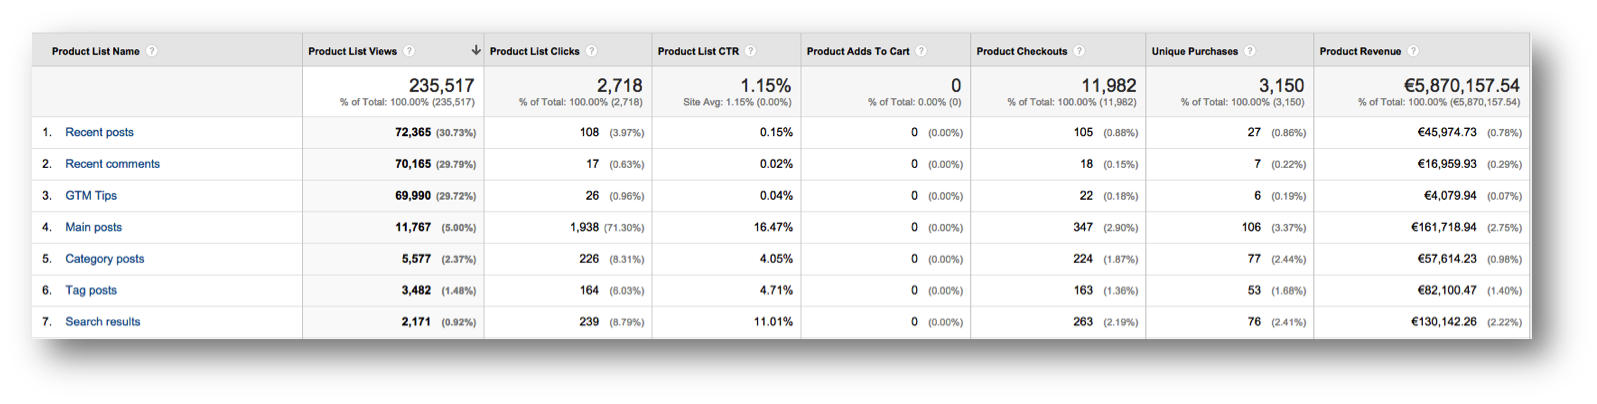 product-list-performance